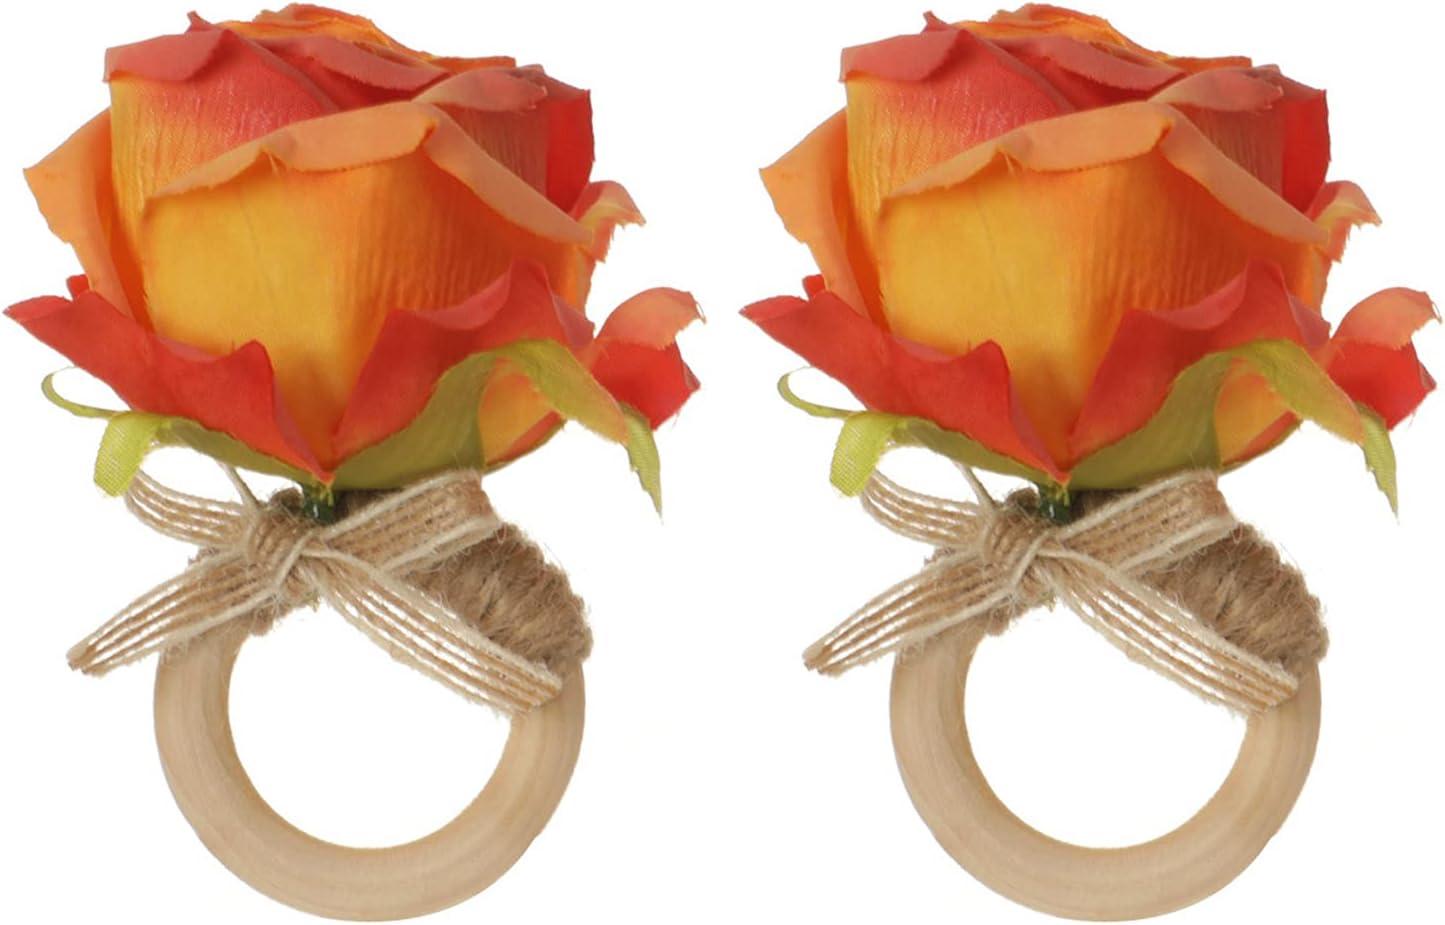 SANWOOD Napkin Buckles Serviette New York depot Mall Decoration Rings Holders